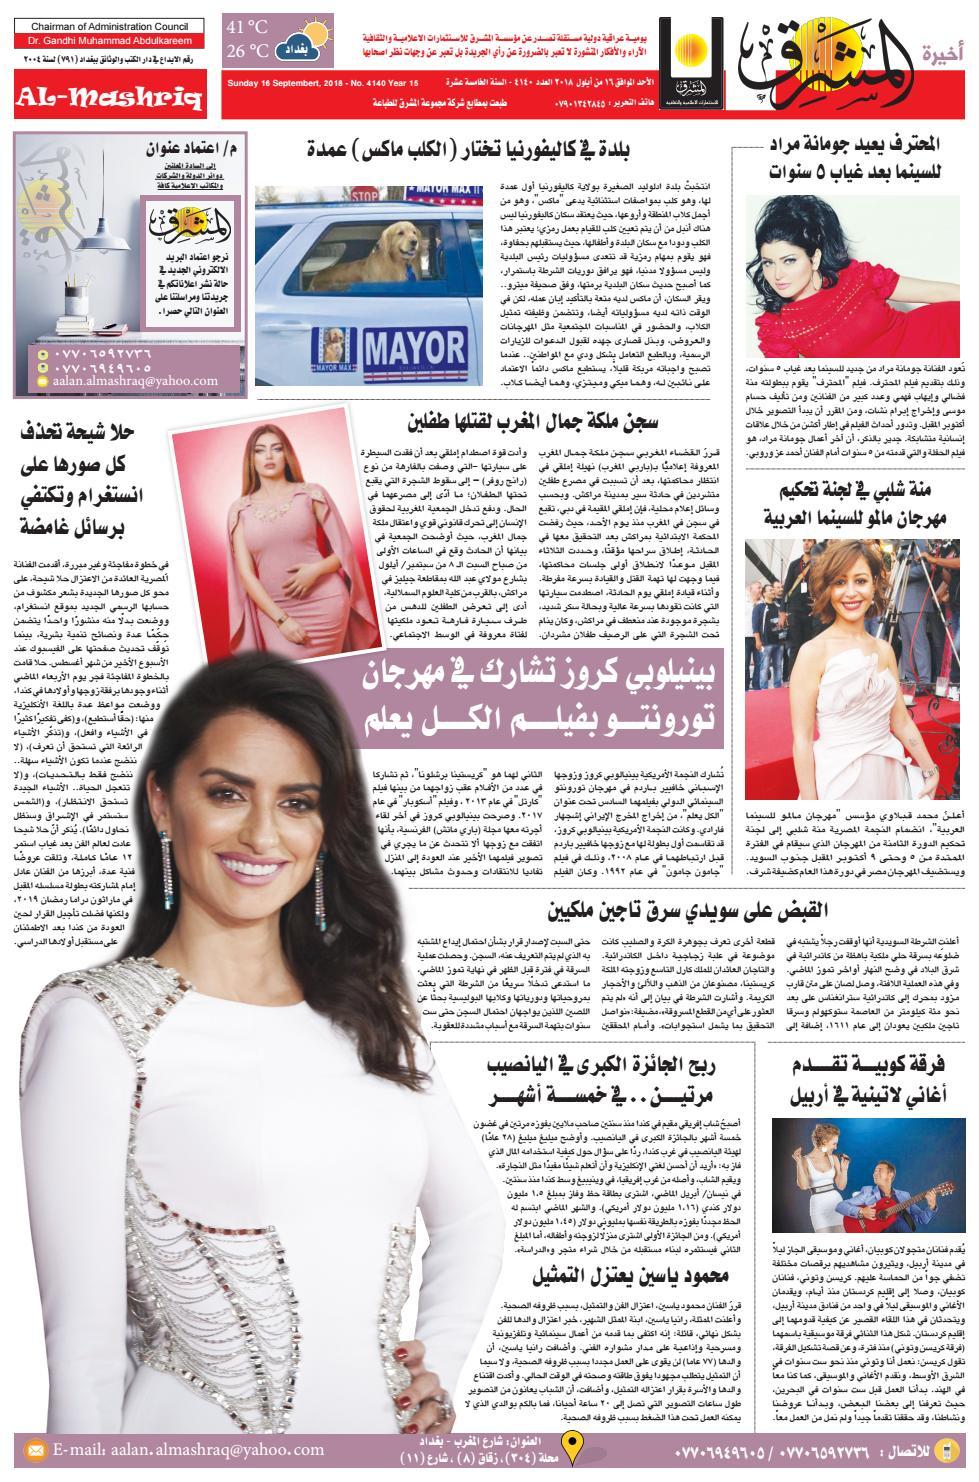 ddcfe660cf3ac 4140 AlmashriqNews by Al Mashriq Newspaper - issuu